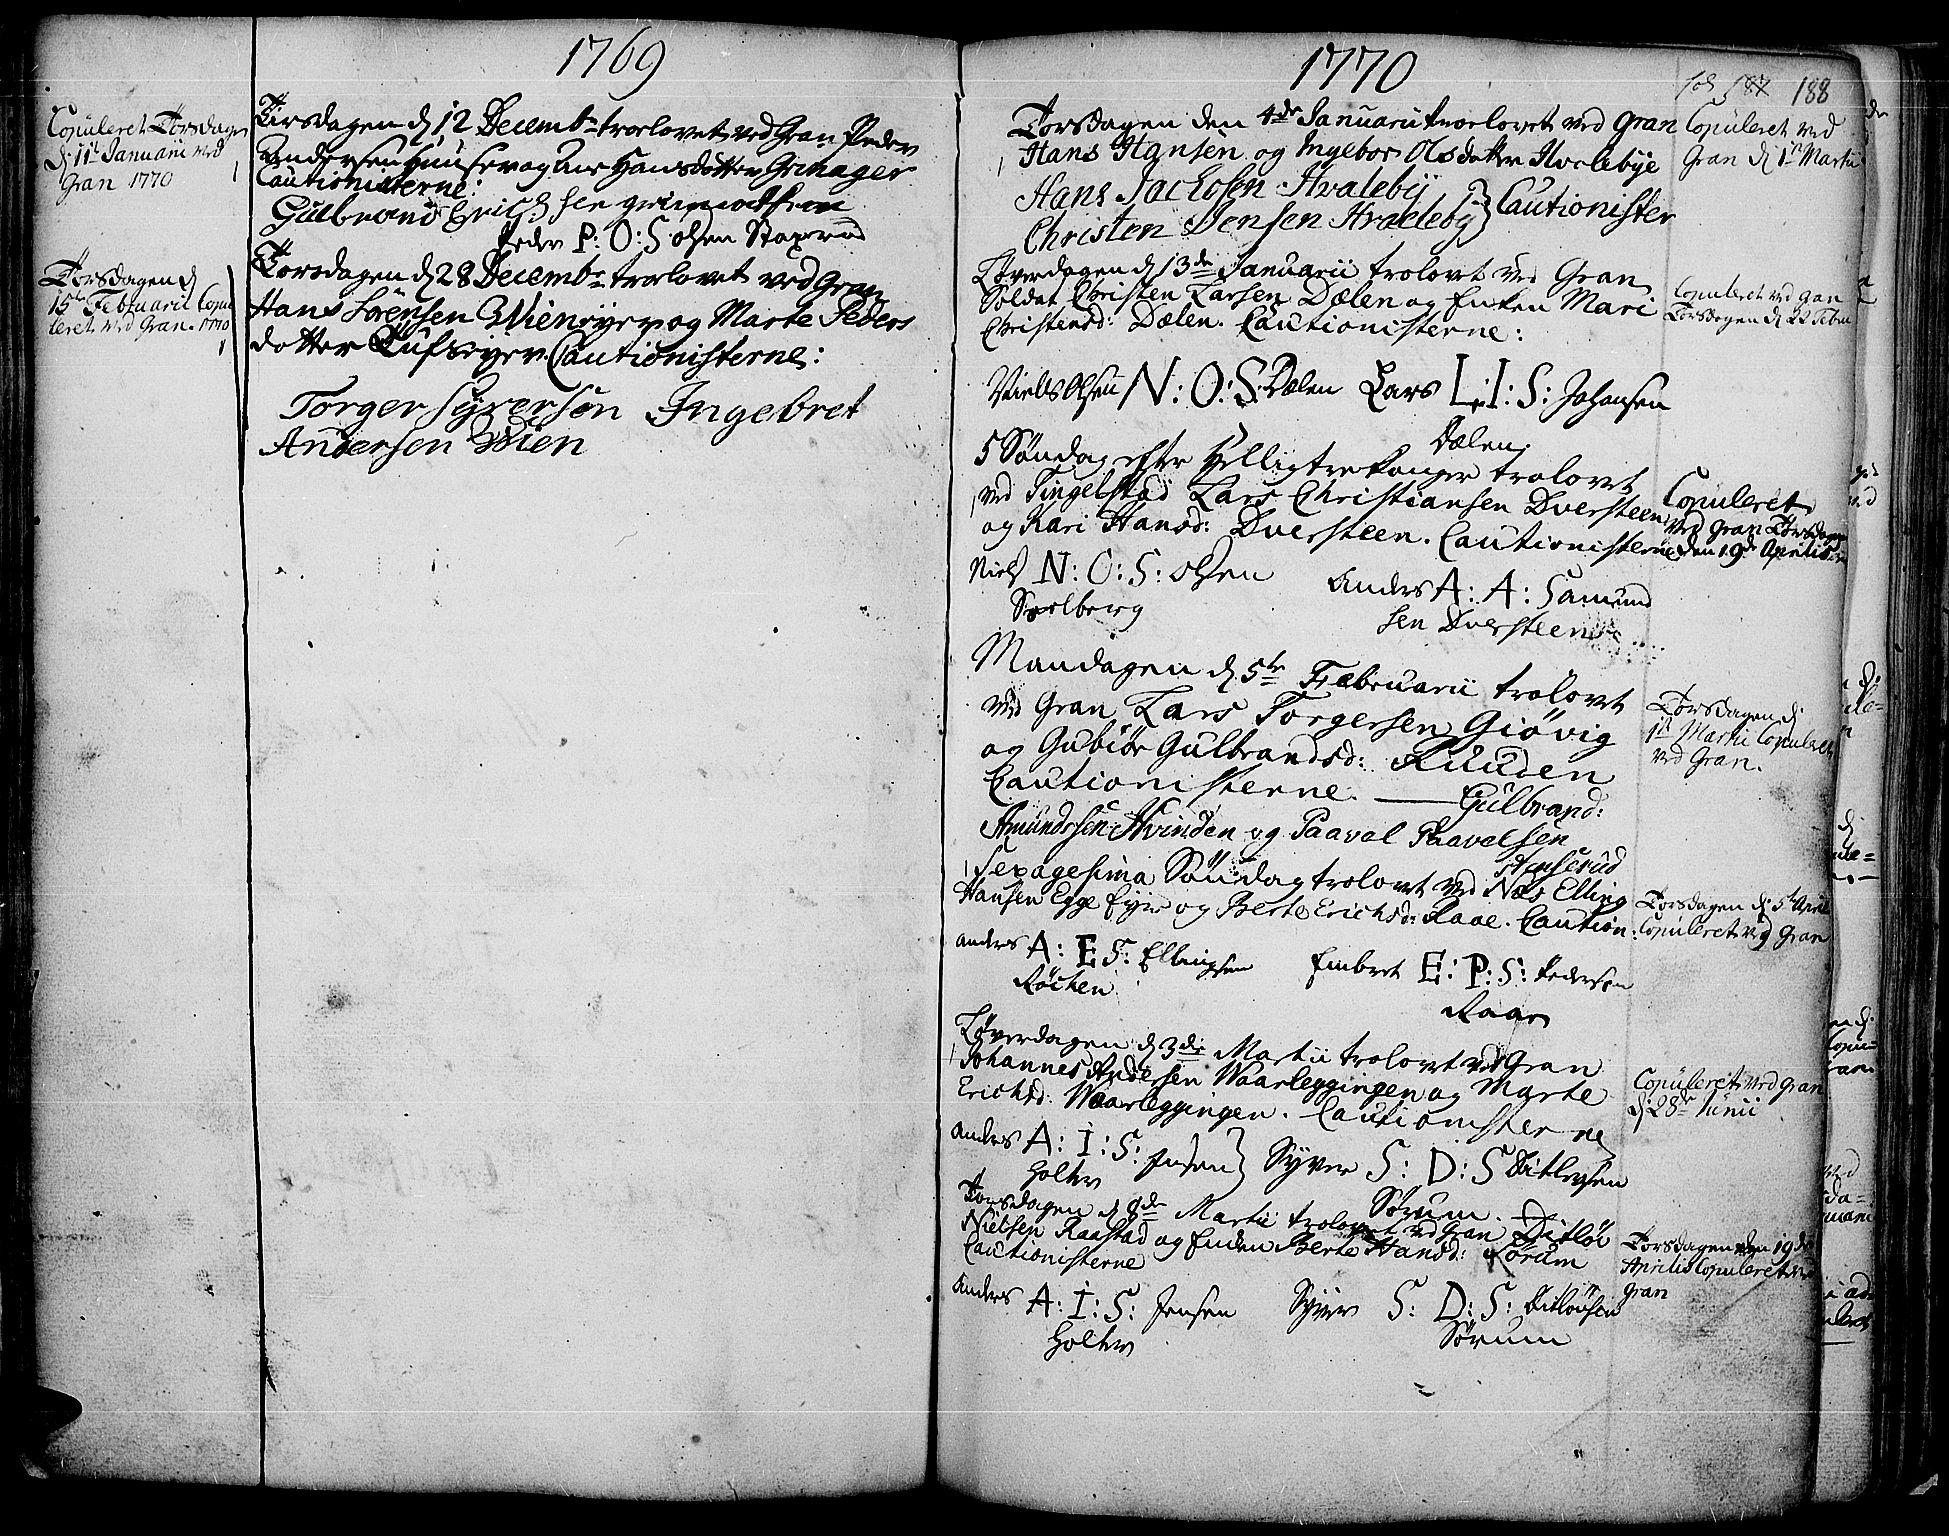 SAH, Gran prestekontor, Ministerialbok nr. 4, 1759-1775, s. 188